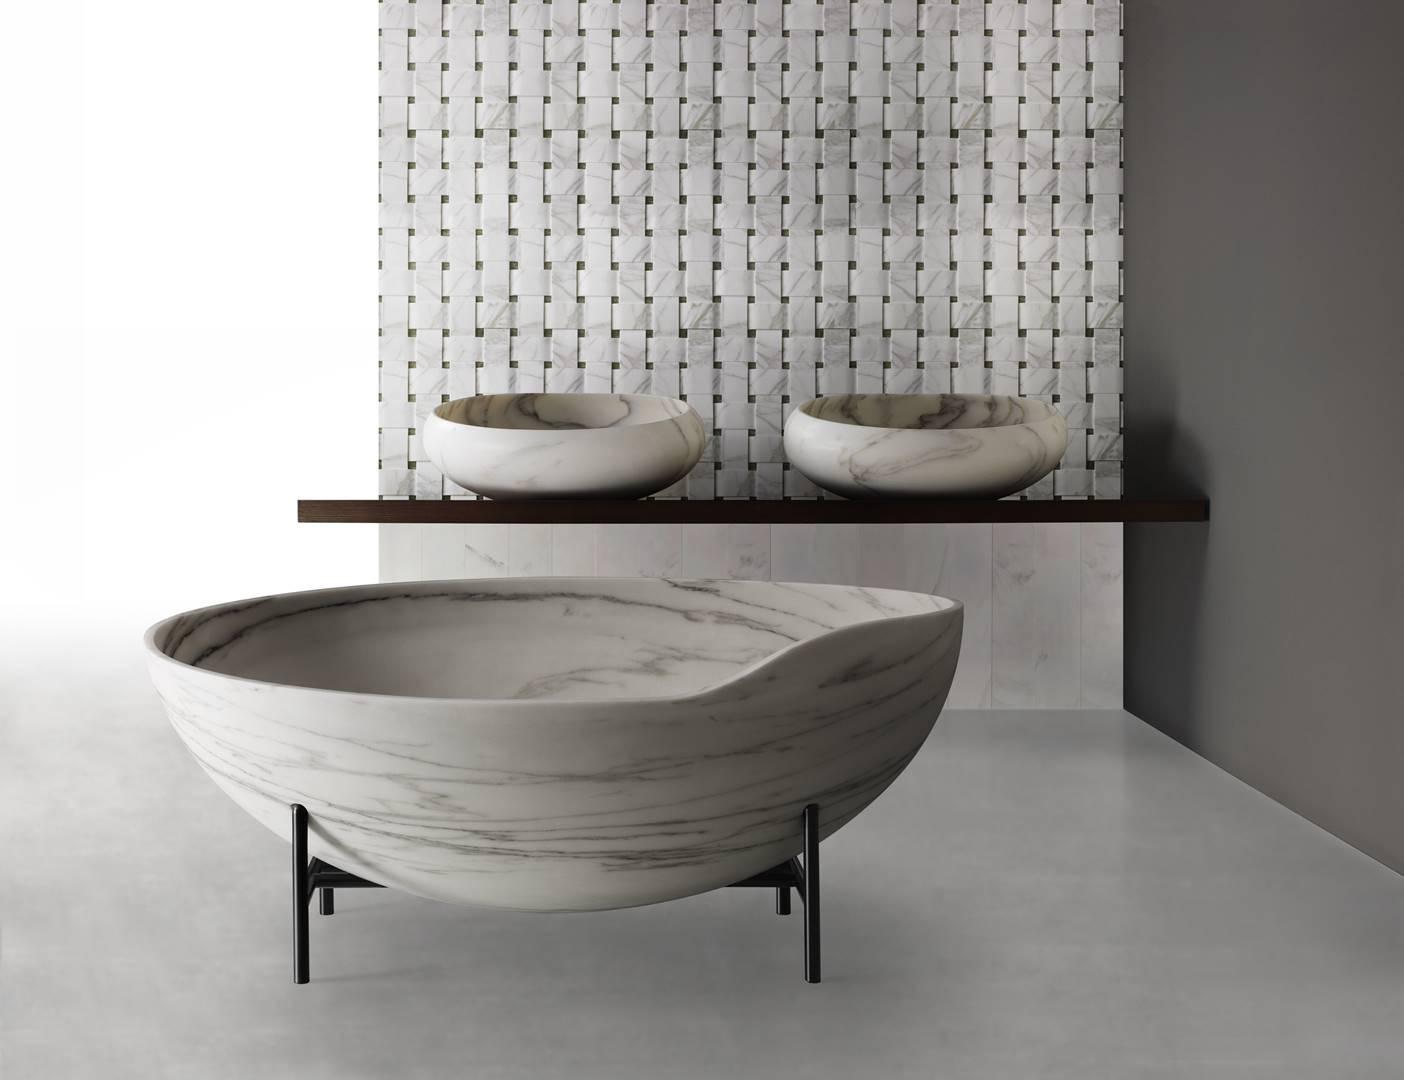 Kreoo_KORA bathtub, Gong Sinks, Taxo Texture (Copy)